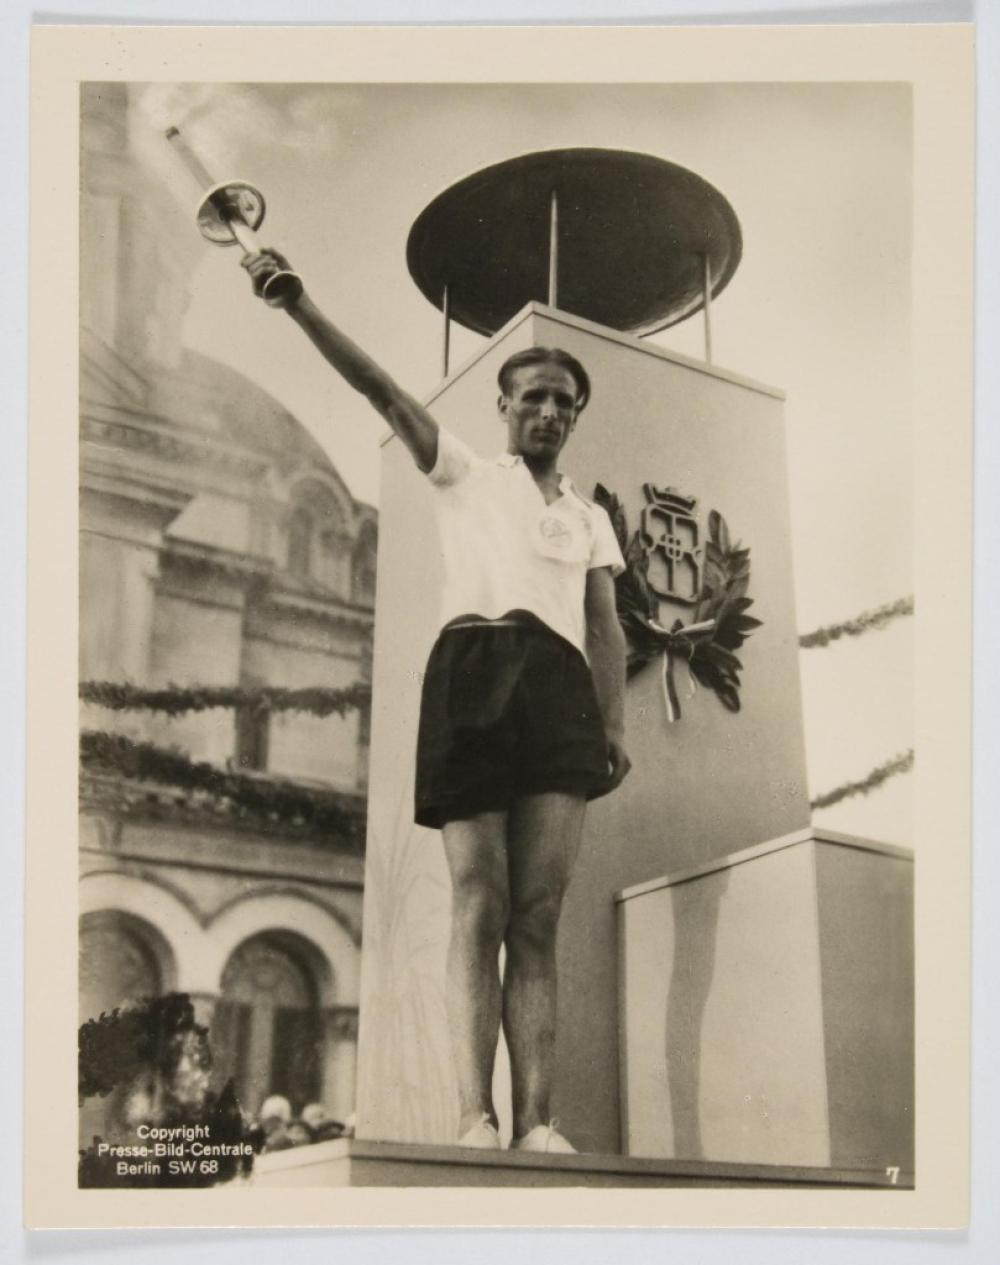 1936 BERLIN OLYMPICS TORCH